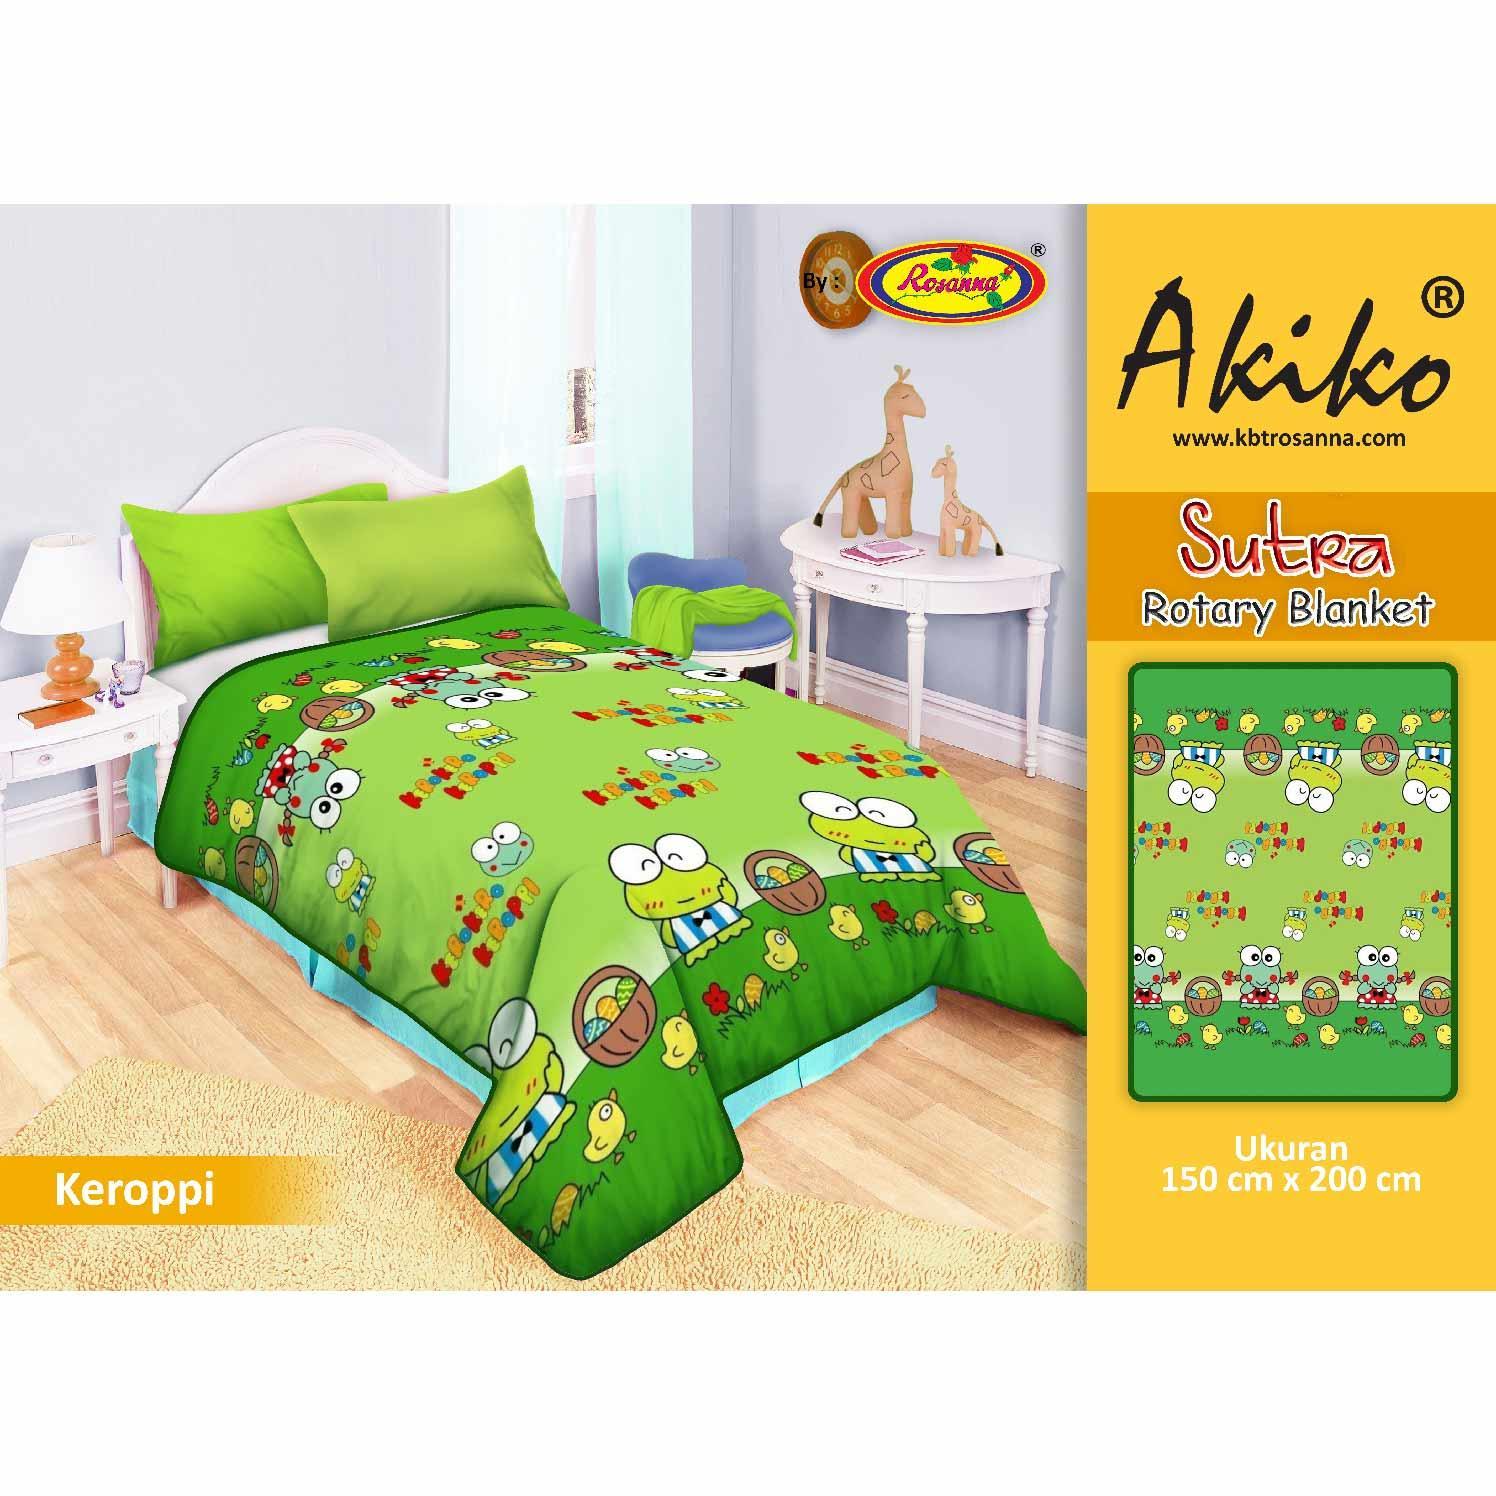 Selimut Rosanna Sutra Panel 150x200 Keroppi Fan Daftar Harga Vito Kids 100x140 Akiko Rotary